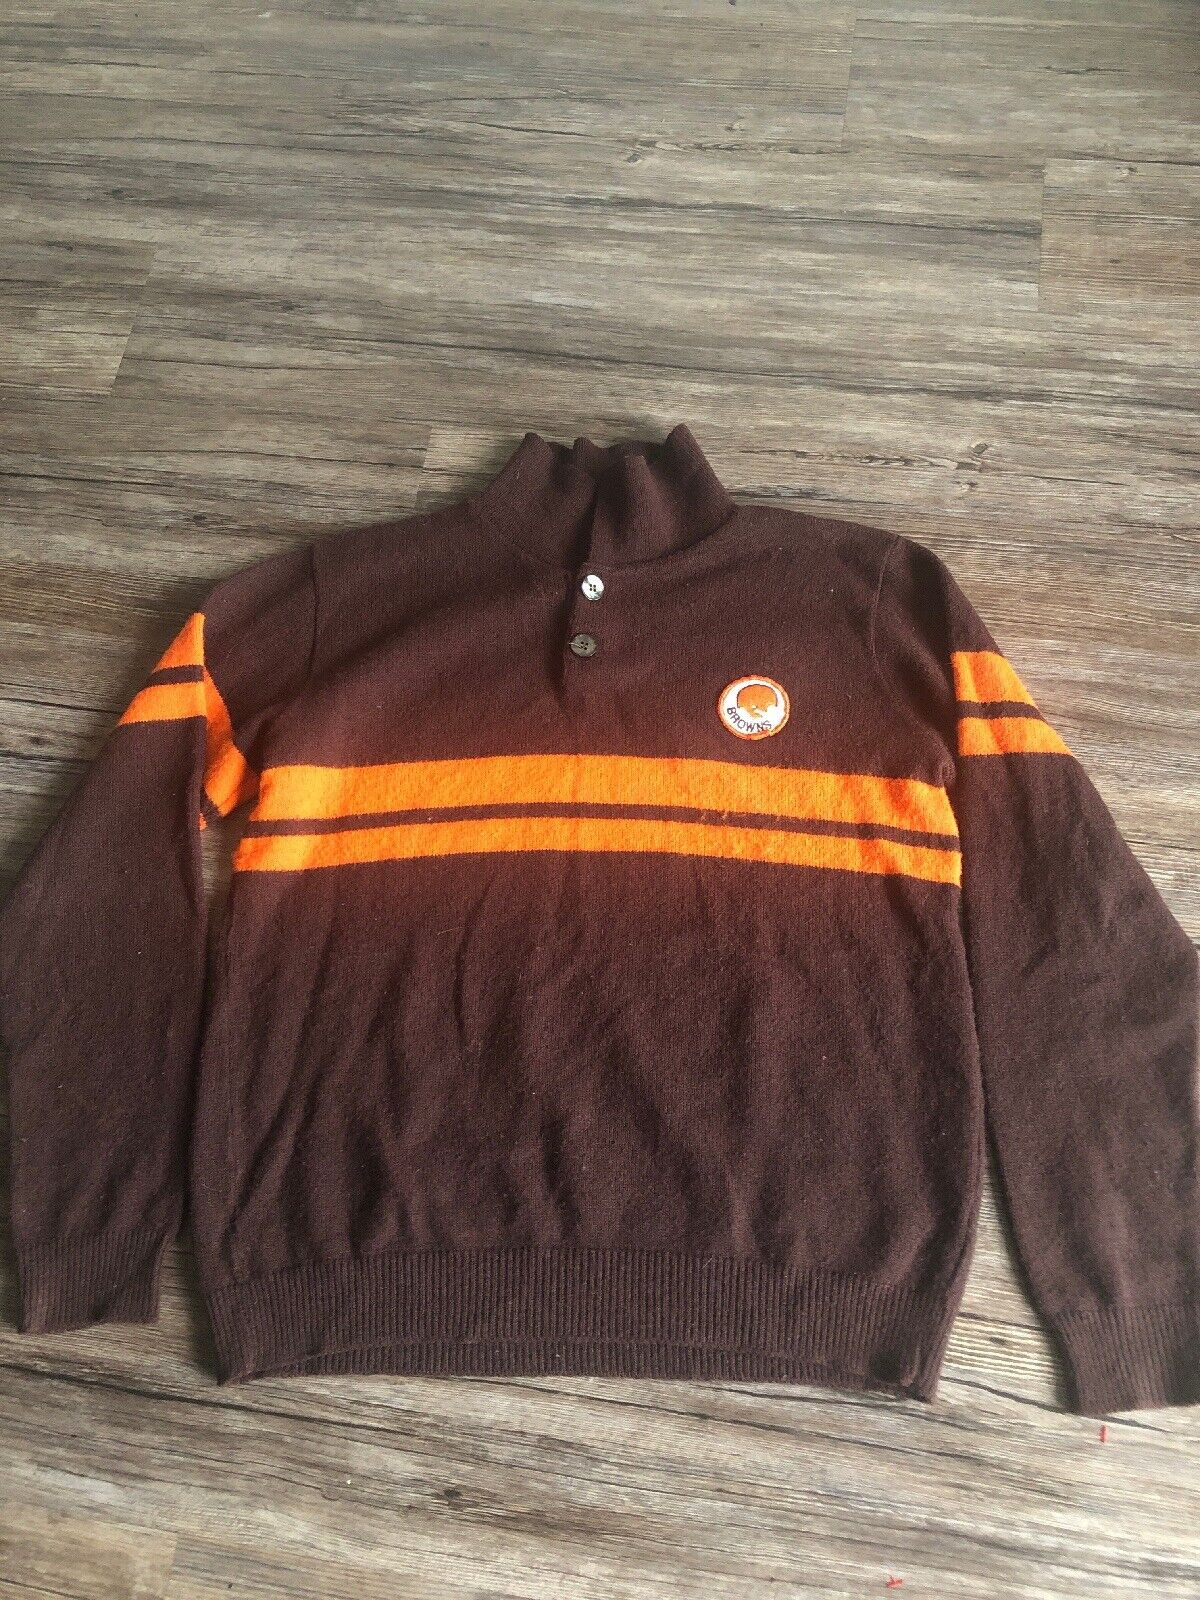 VINTAGE 70s Cleveland brauns Sweater Collar NFL Football Rare Orange Stripe